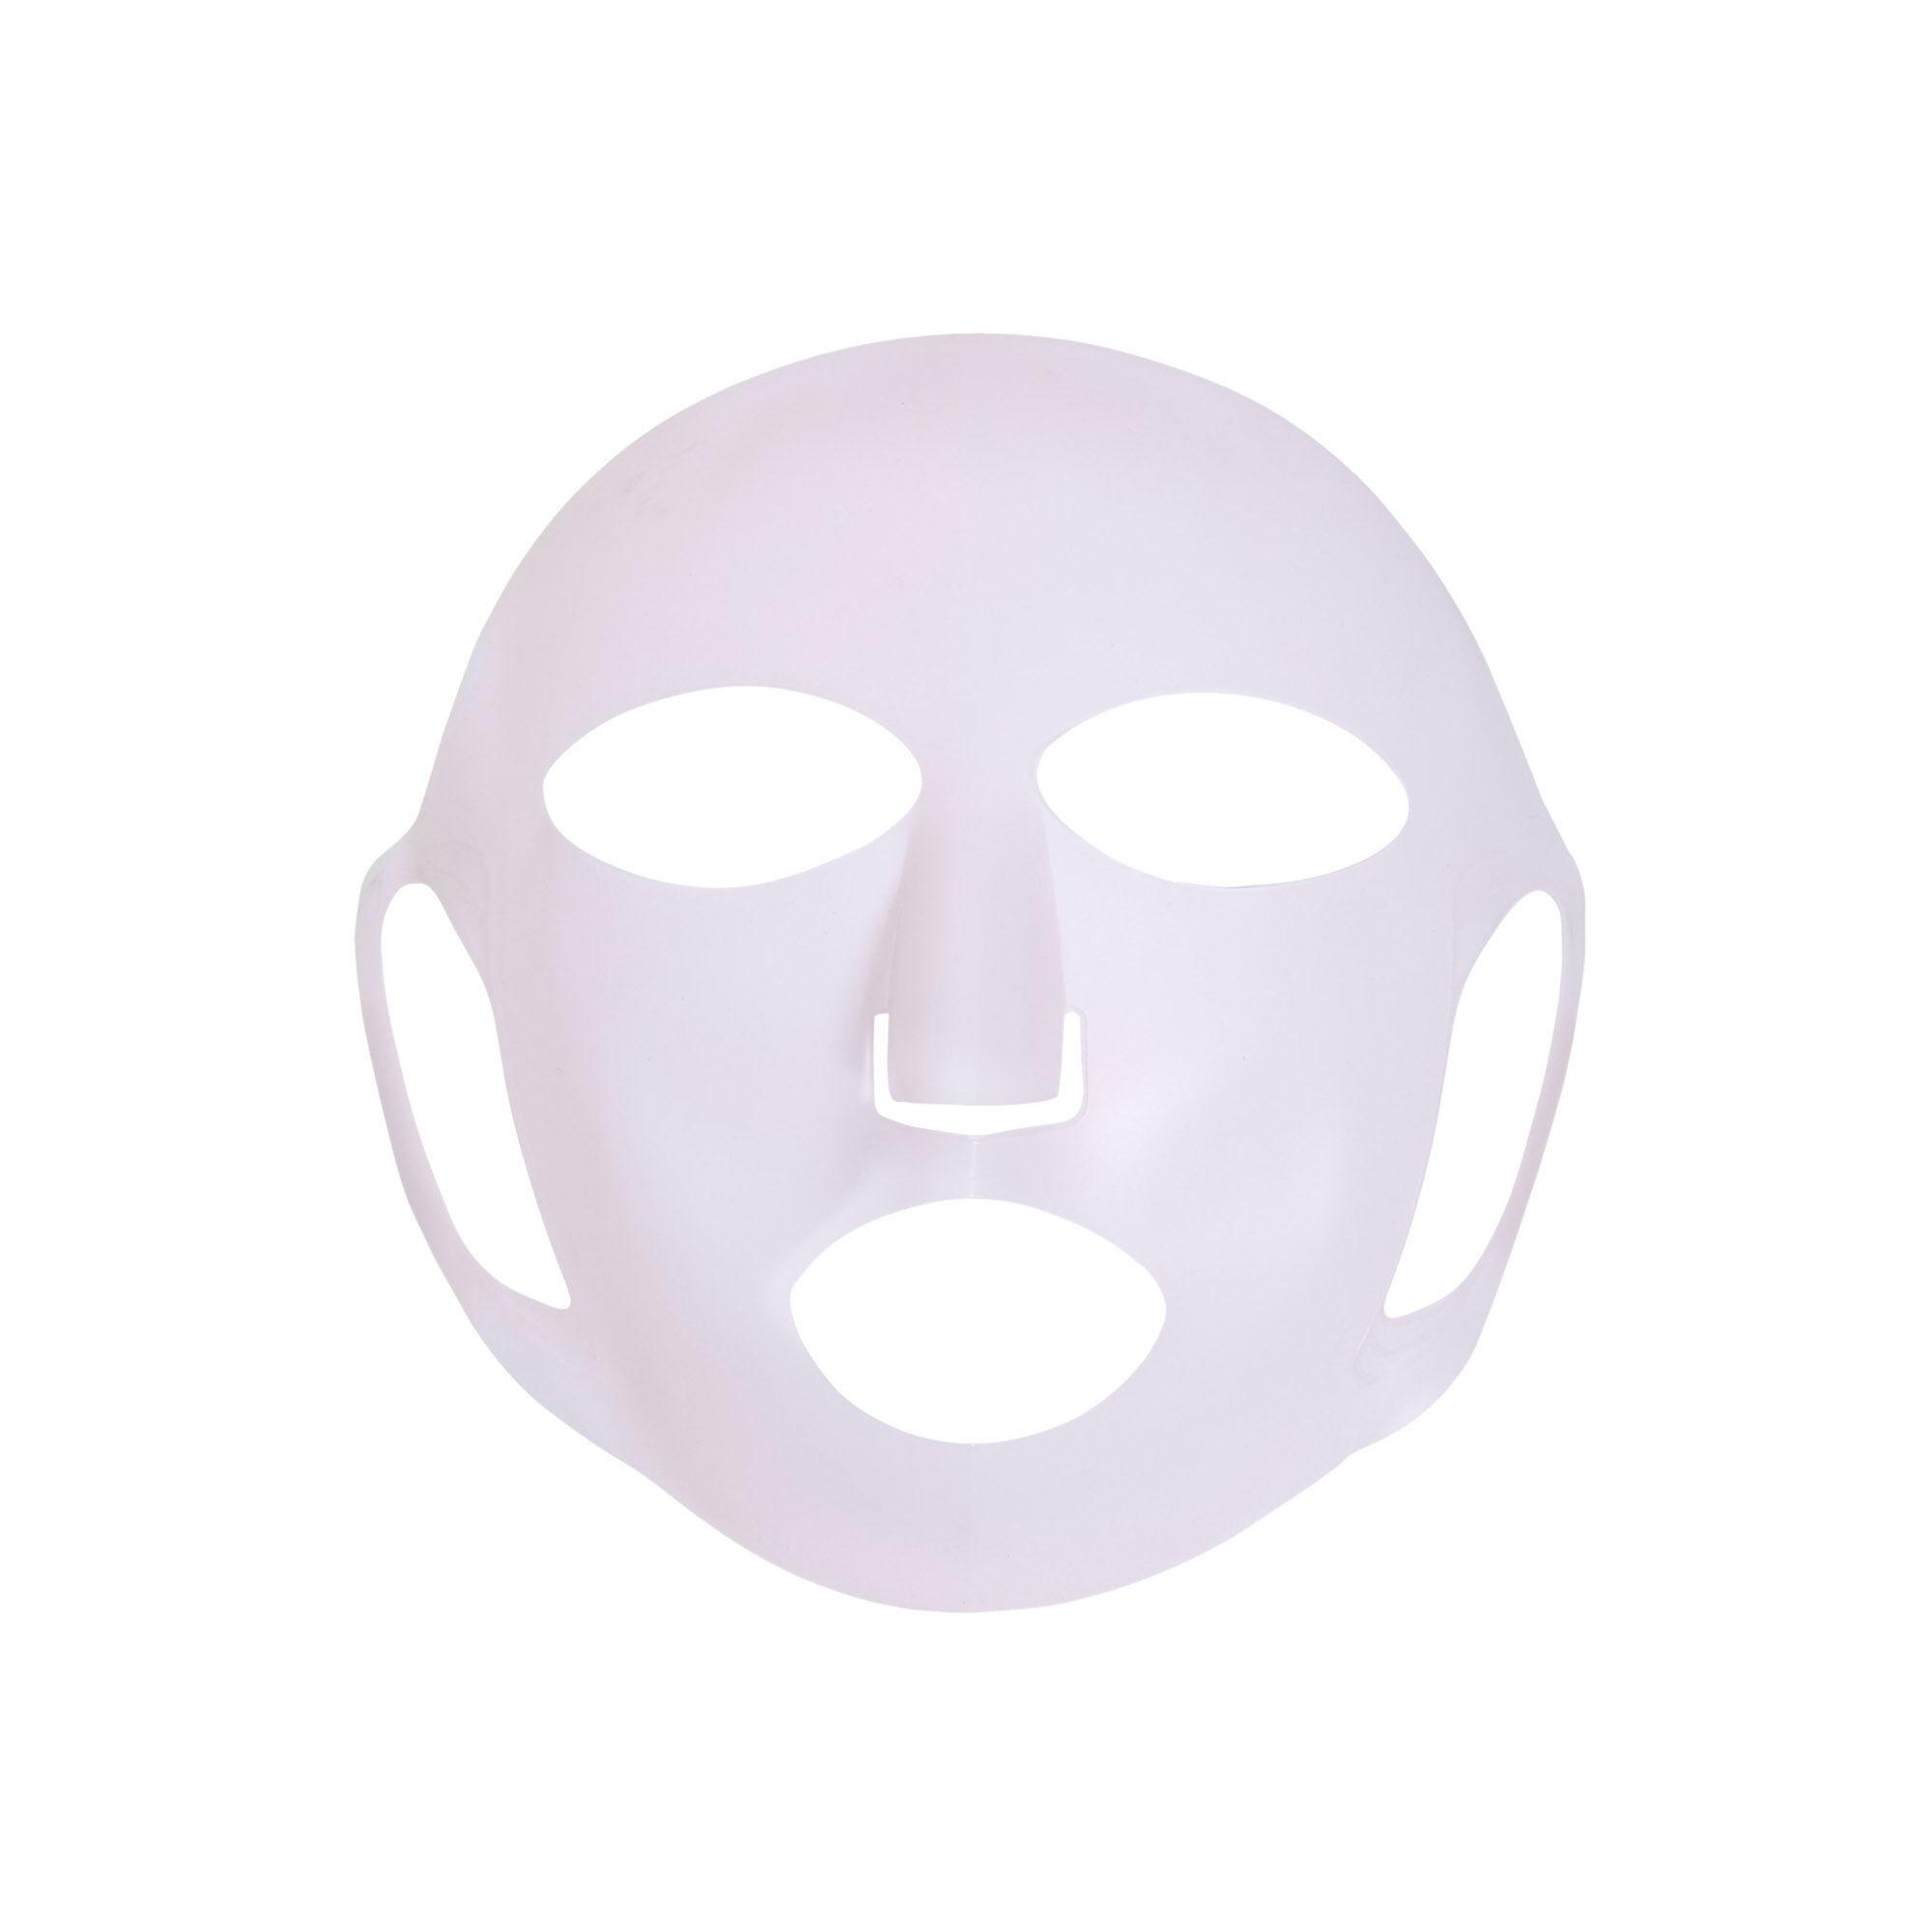 Reusable Magic Silicone Sheet Mask